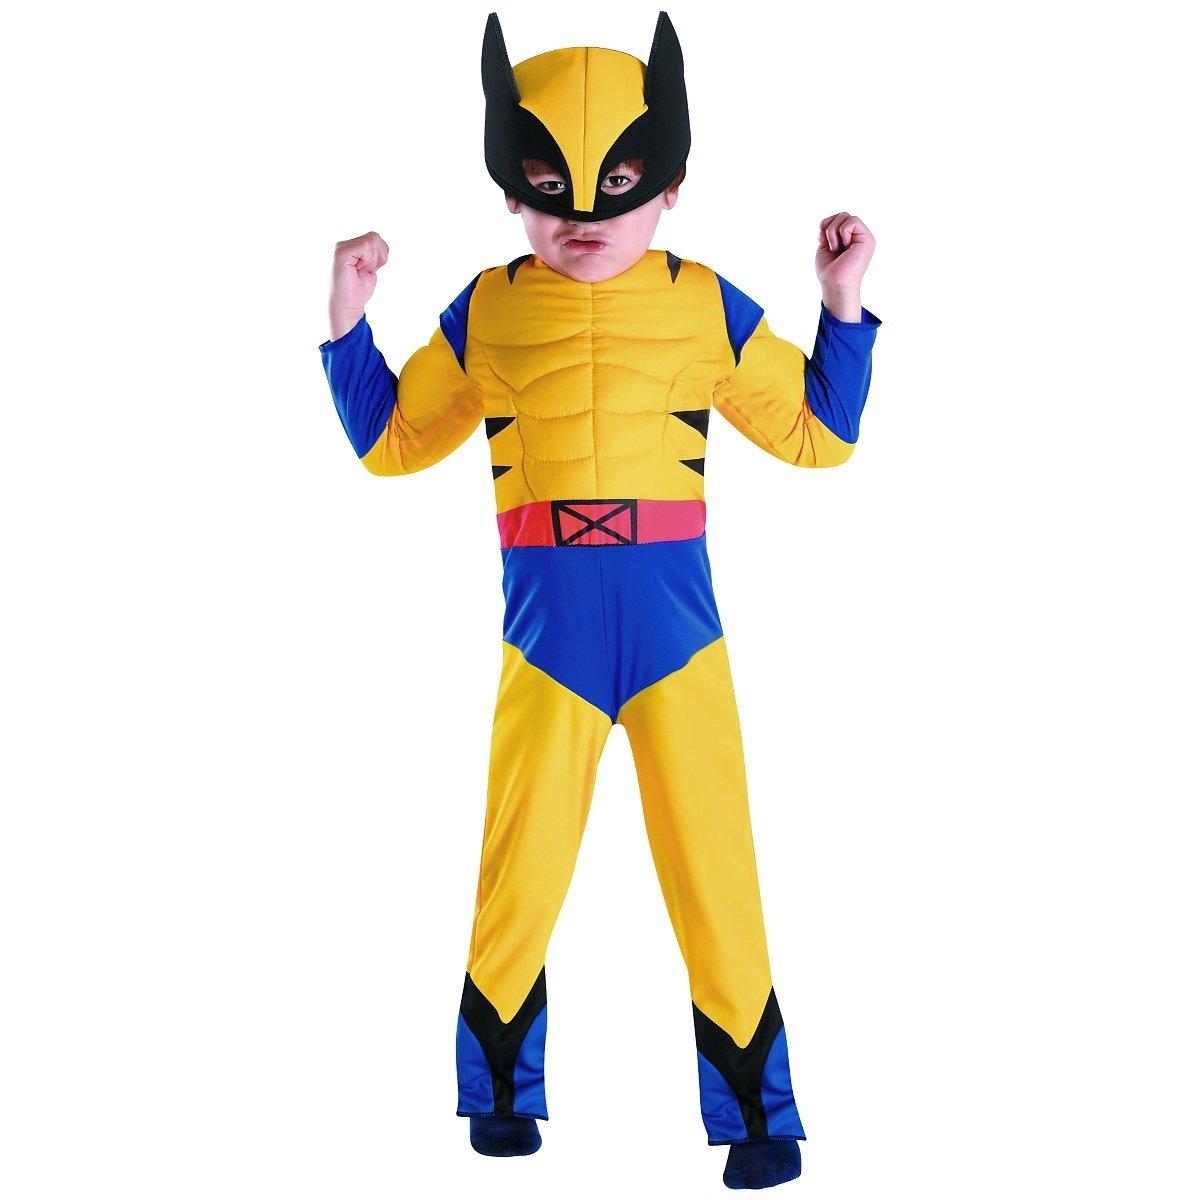 sc 1 st  Amazon.com & Amazon.com: Wolverine Muscle Toddler Costume - Toddler Medium: Clothing